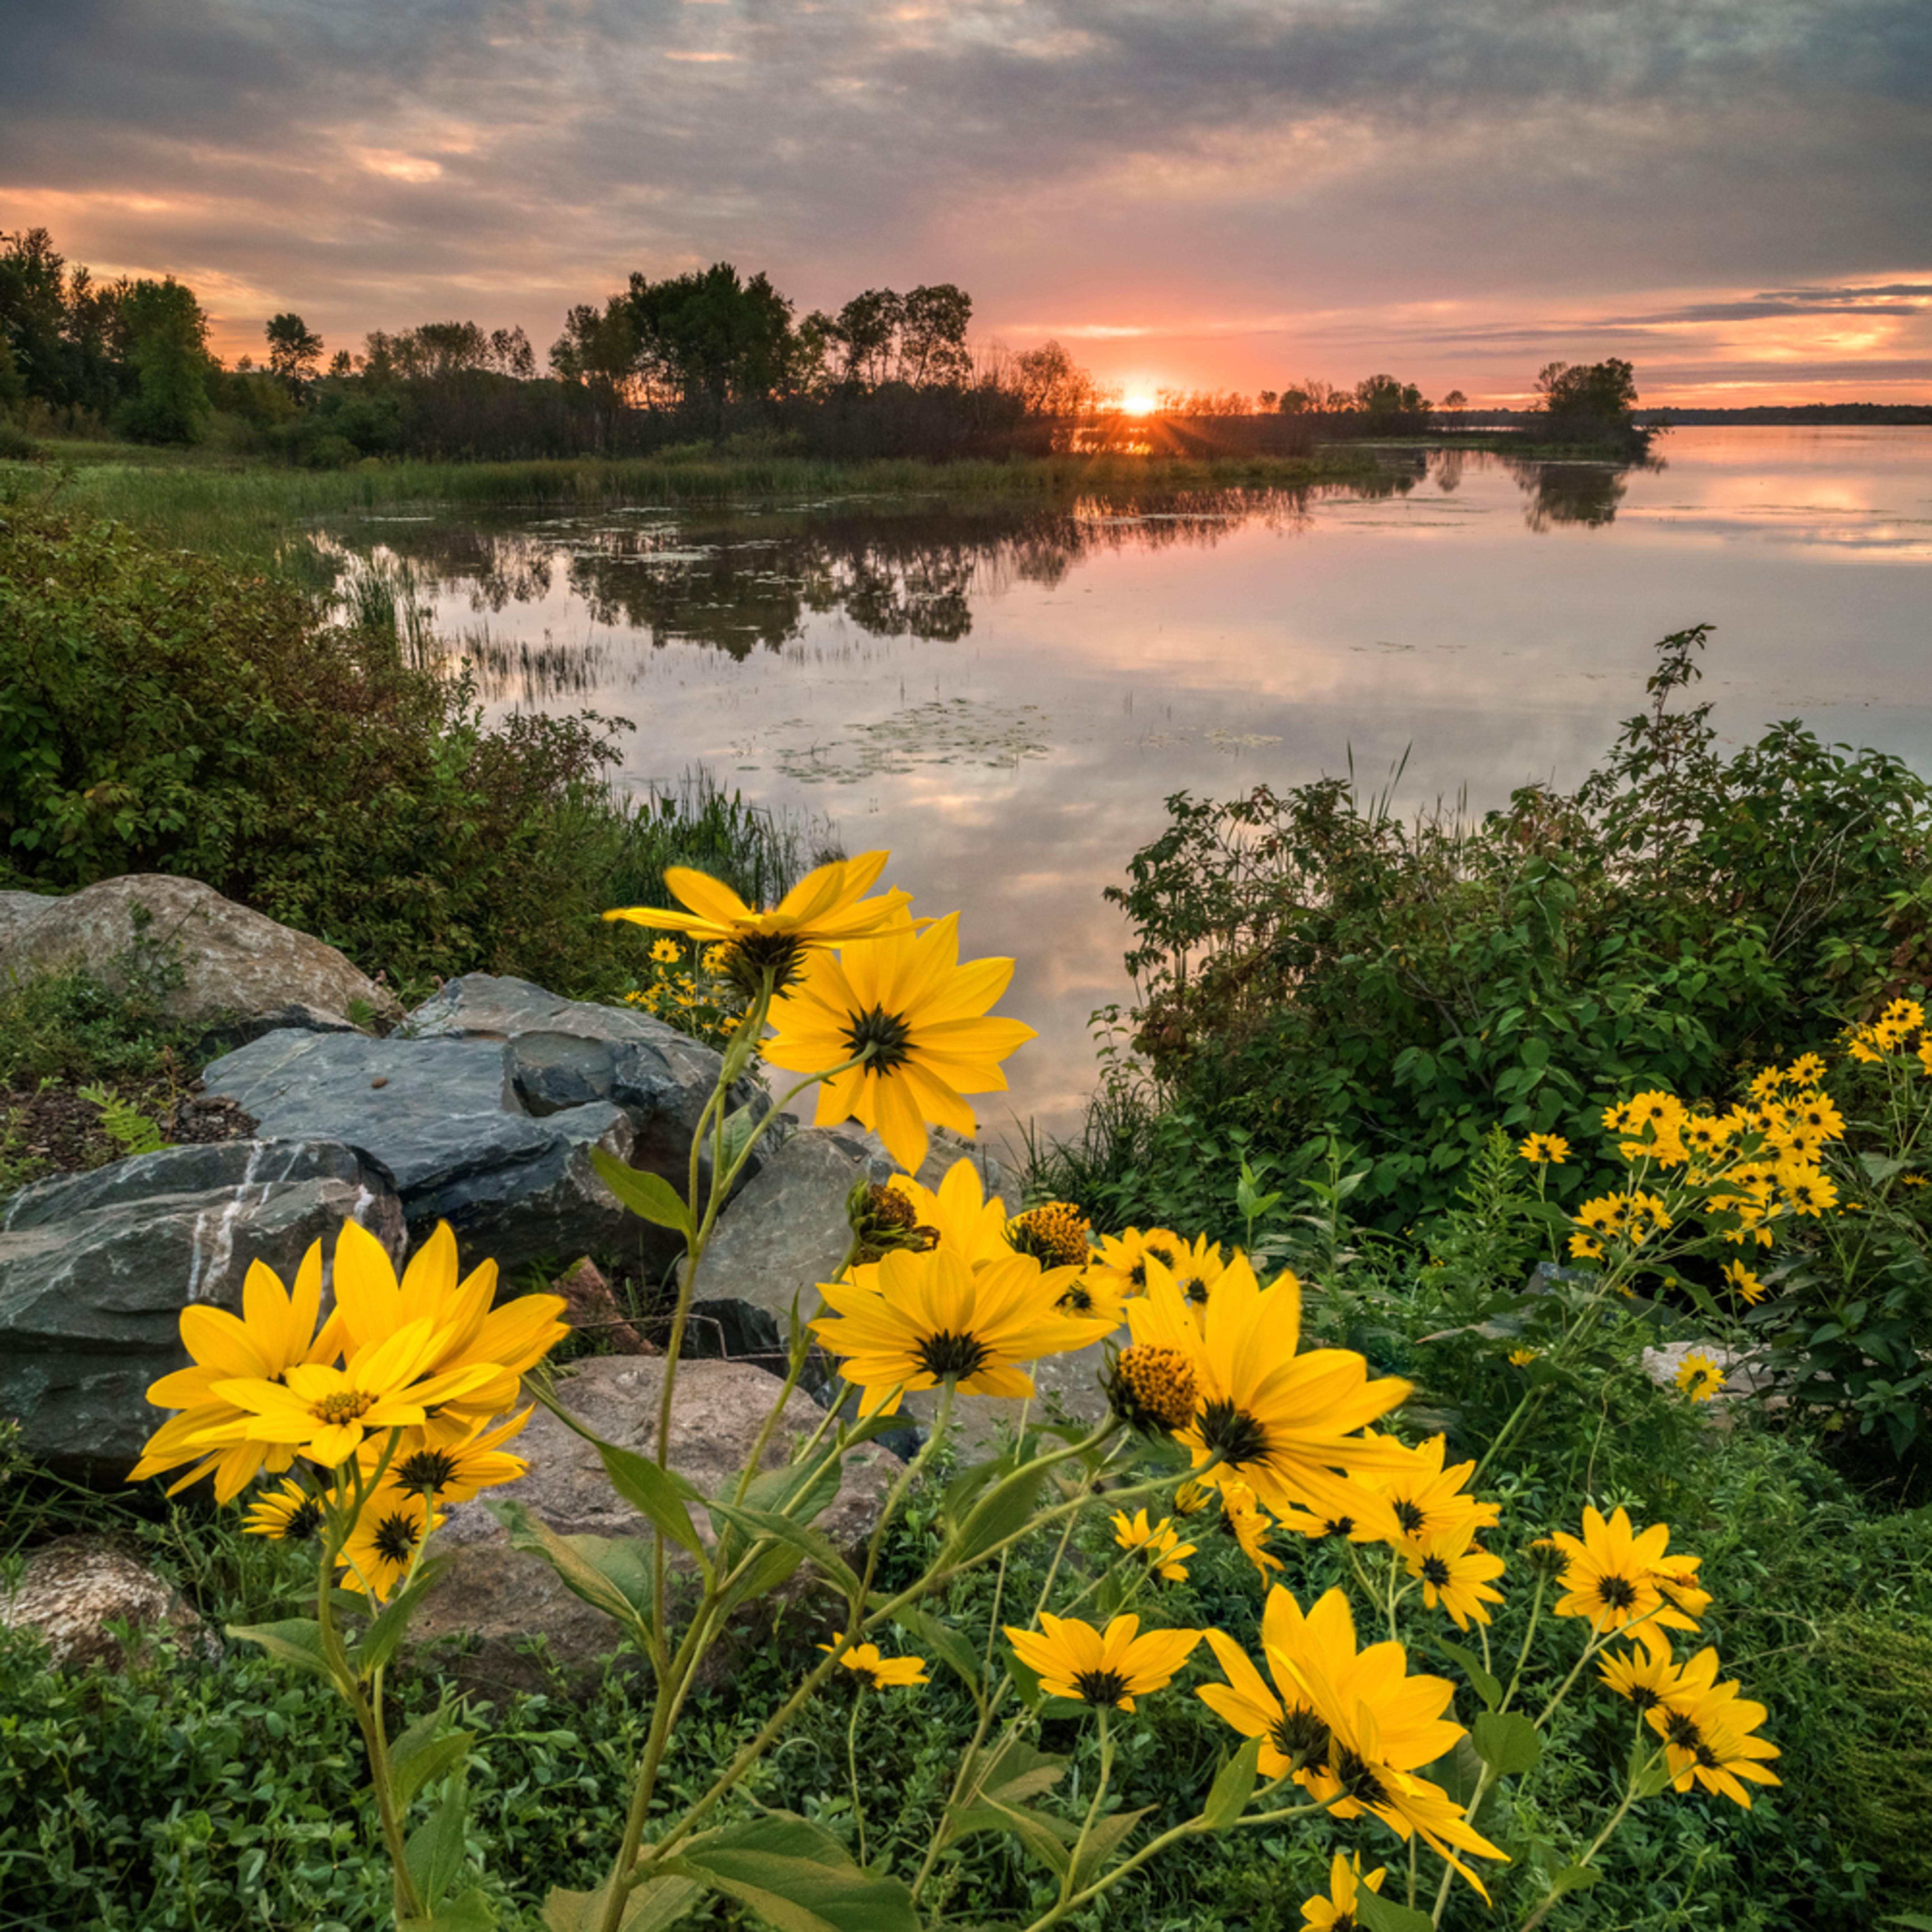 Not yet titled st louis river sunrise xygqrx